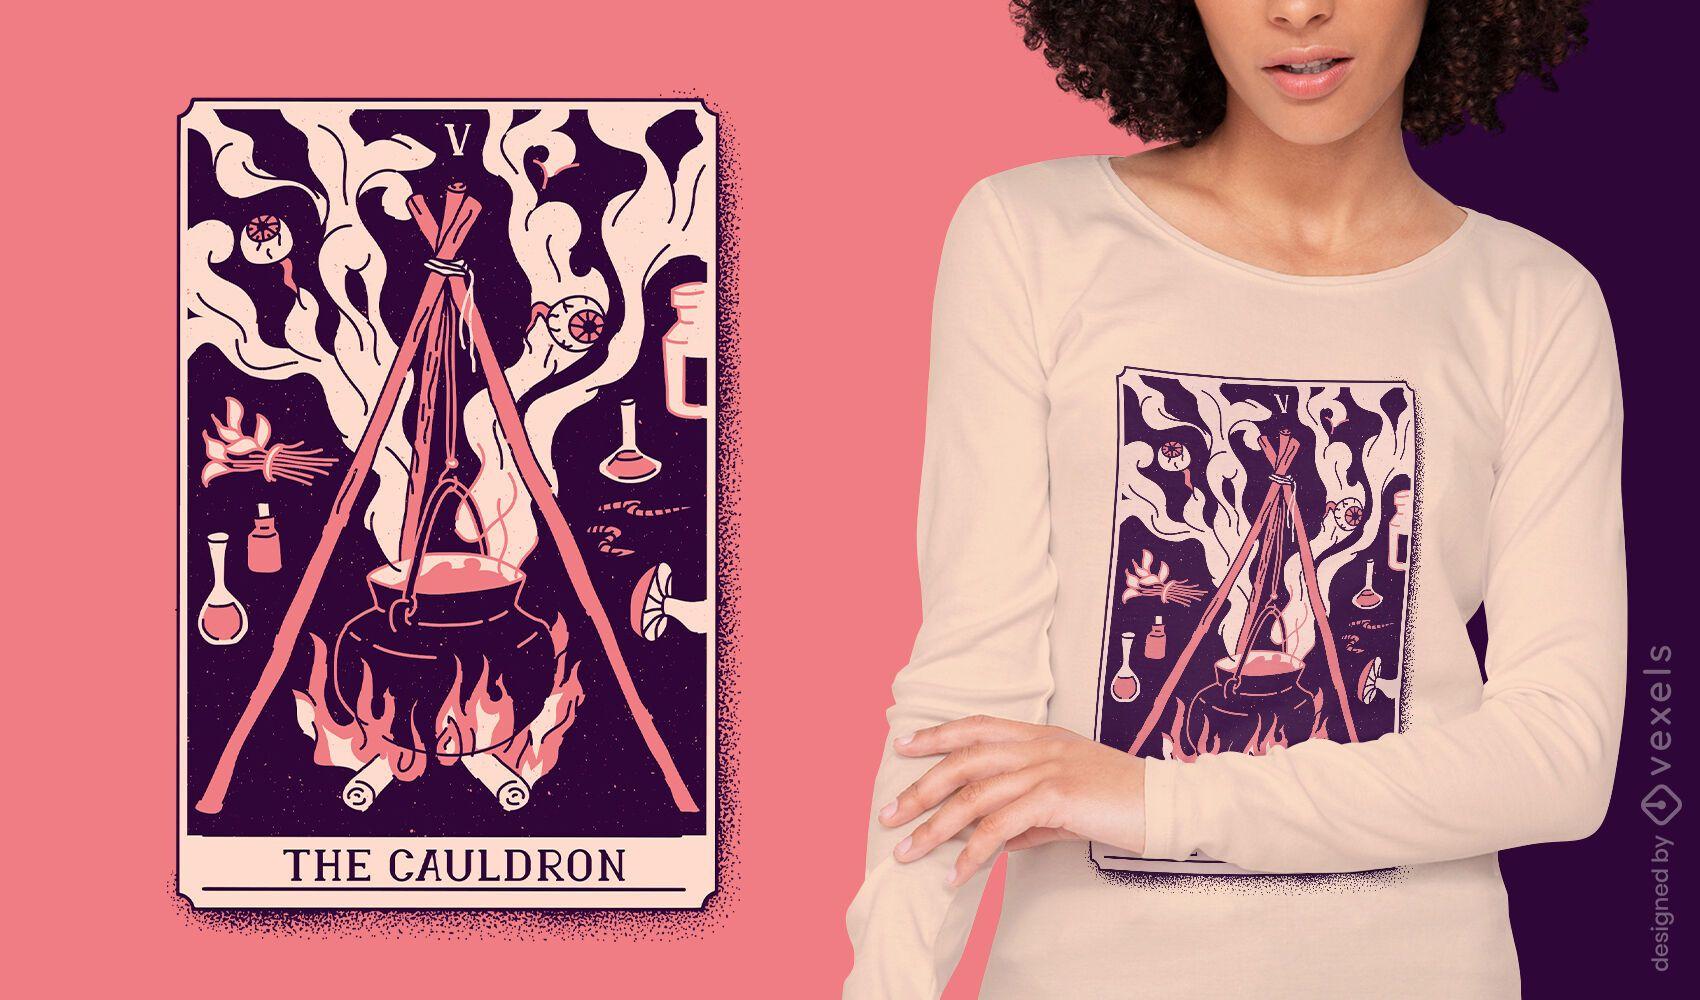 Cauldron mystical tarot card t-shirt design